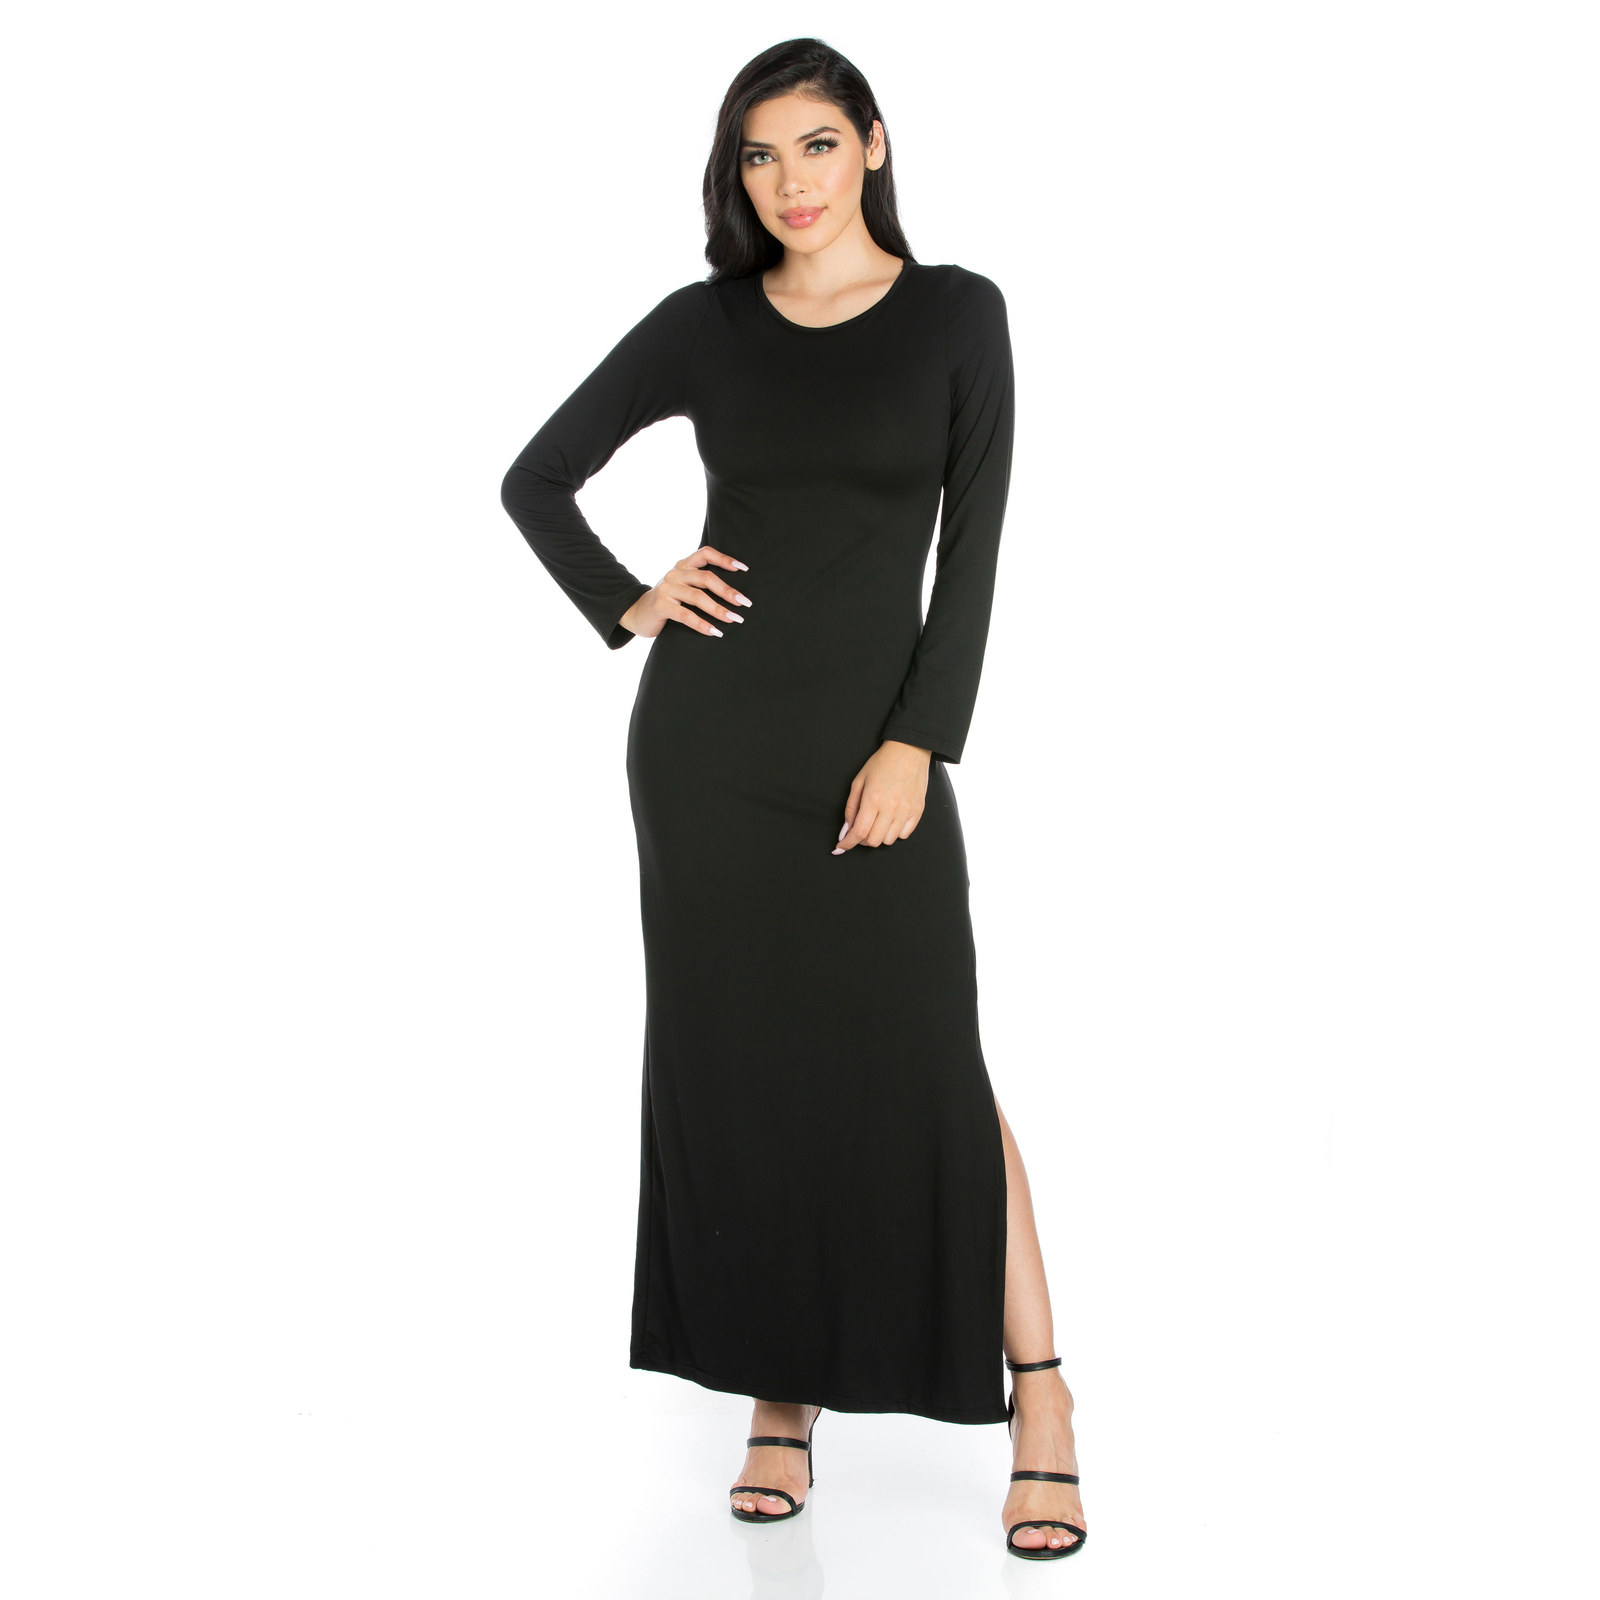 be5ae2b9330 Maternity Maxi Dresses Walmart - Gomes Weine AG